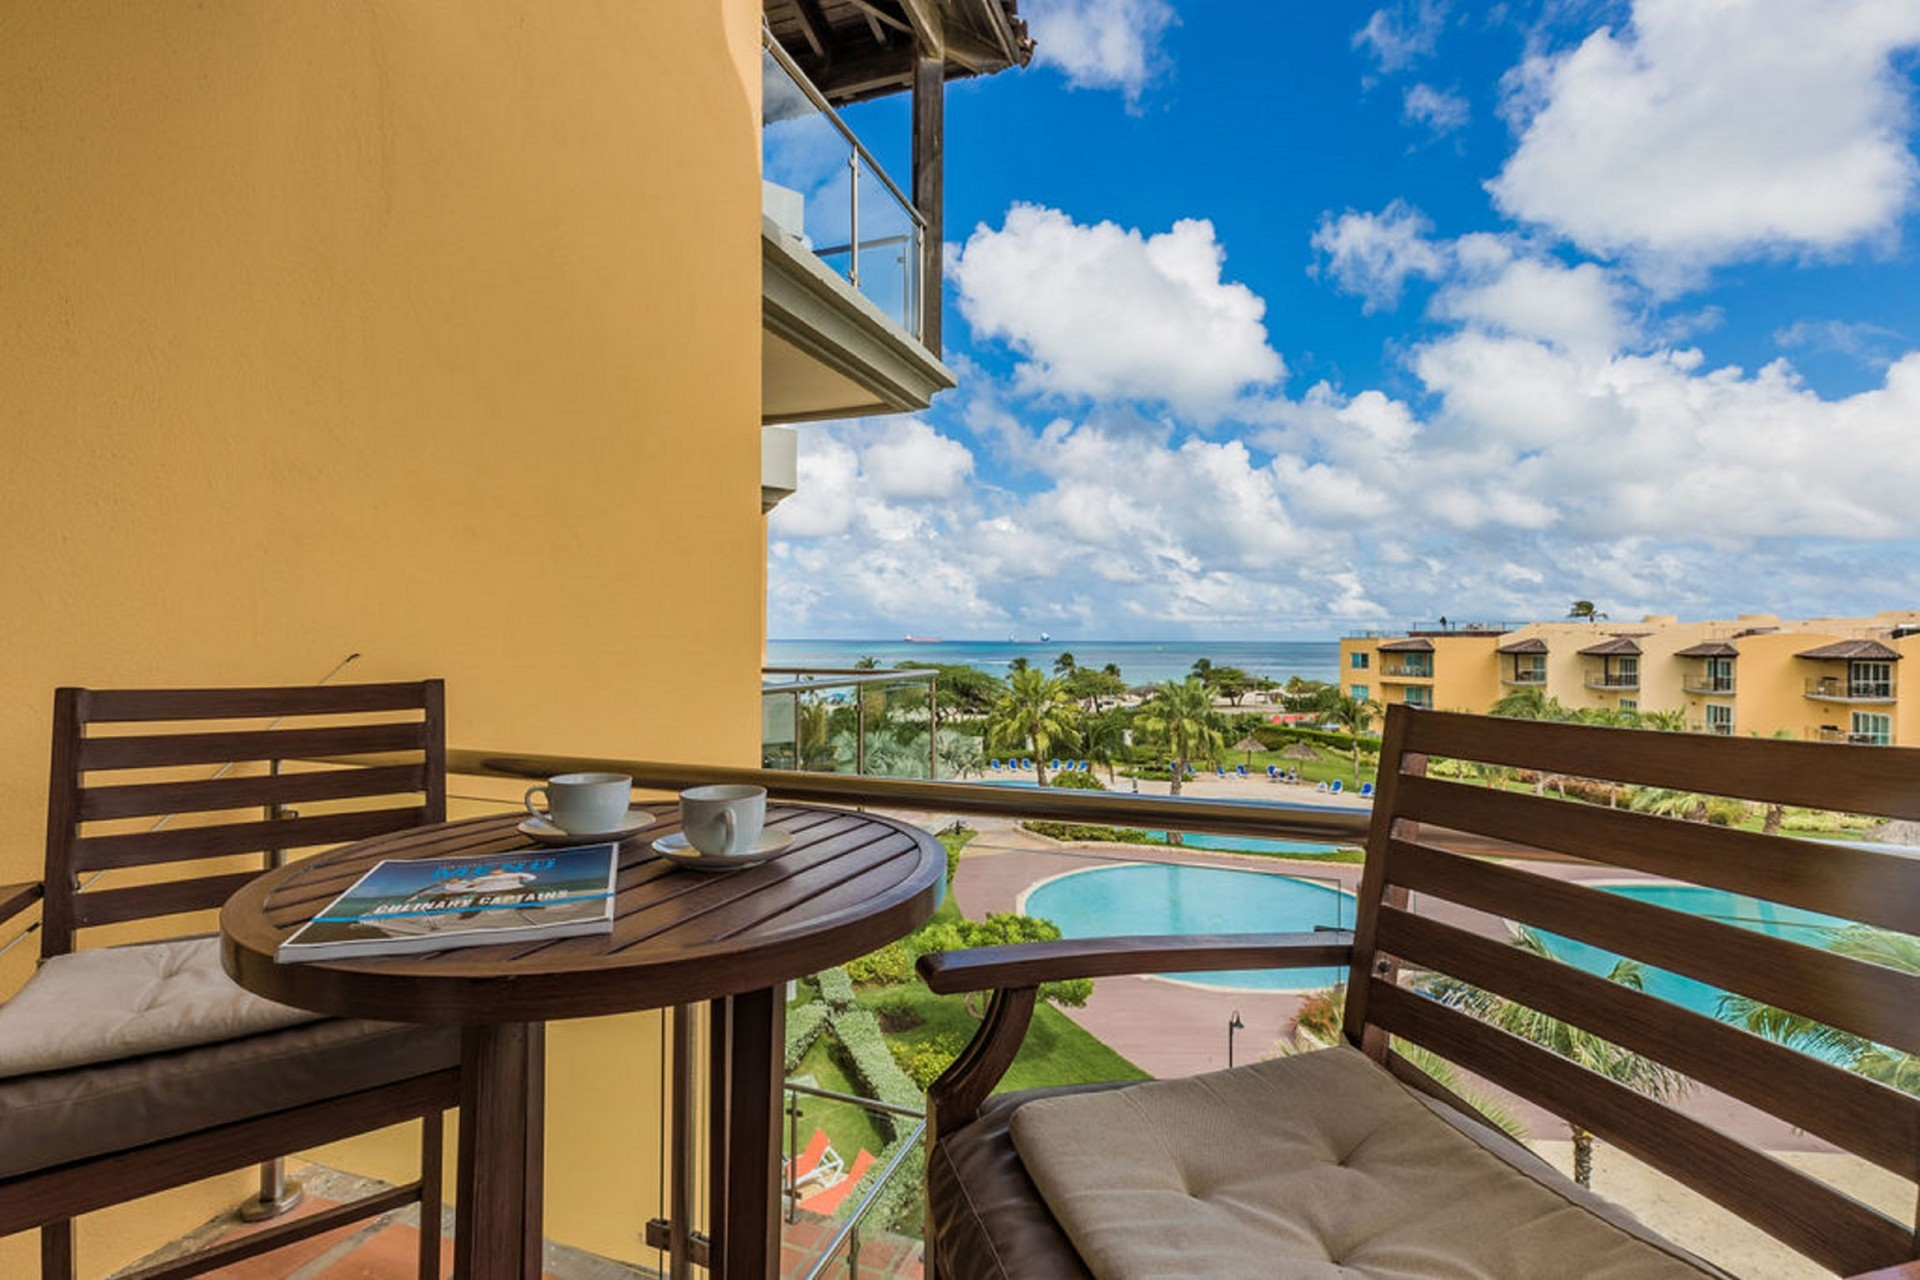 Oceania 432- Large 1 bedroom Ocean Front Condo w amazing views photo 5